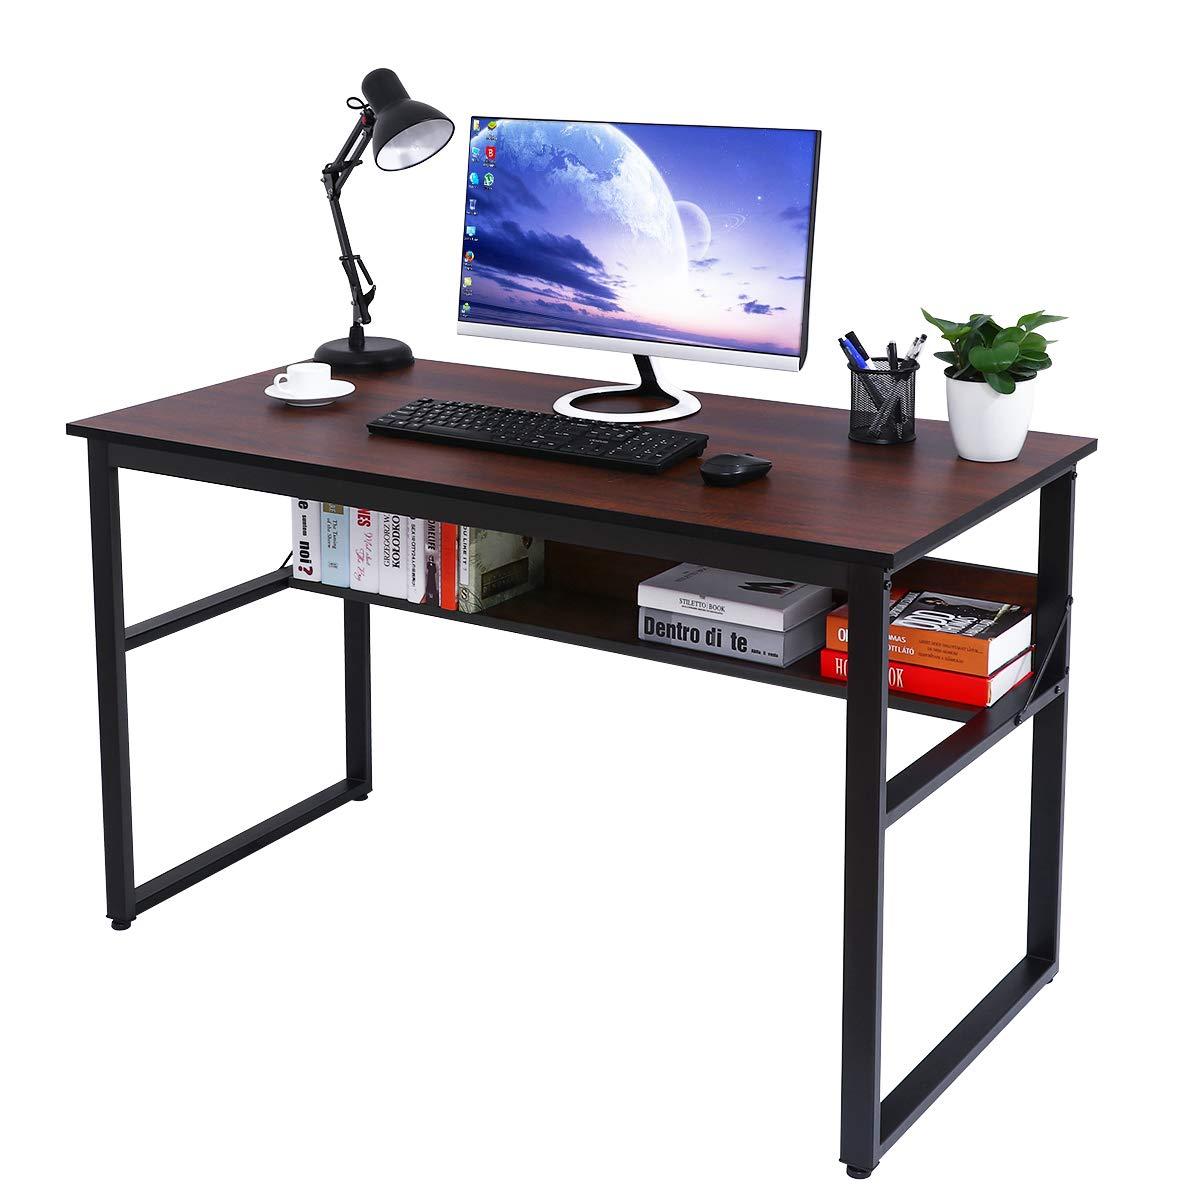 Miraculous Details About Homemaxs Computer Desk With Bookshelf 47X23 Large Office Desk Workstation Home Interior And Landscaping Palasignezvosmurscom